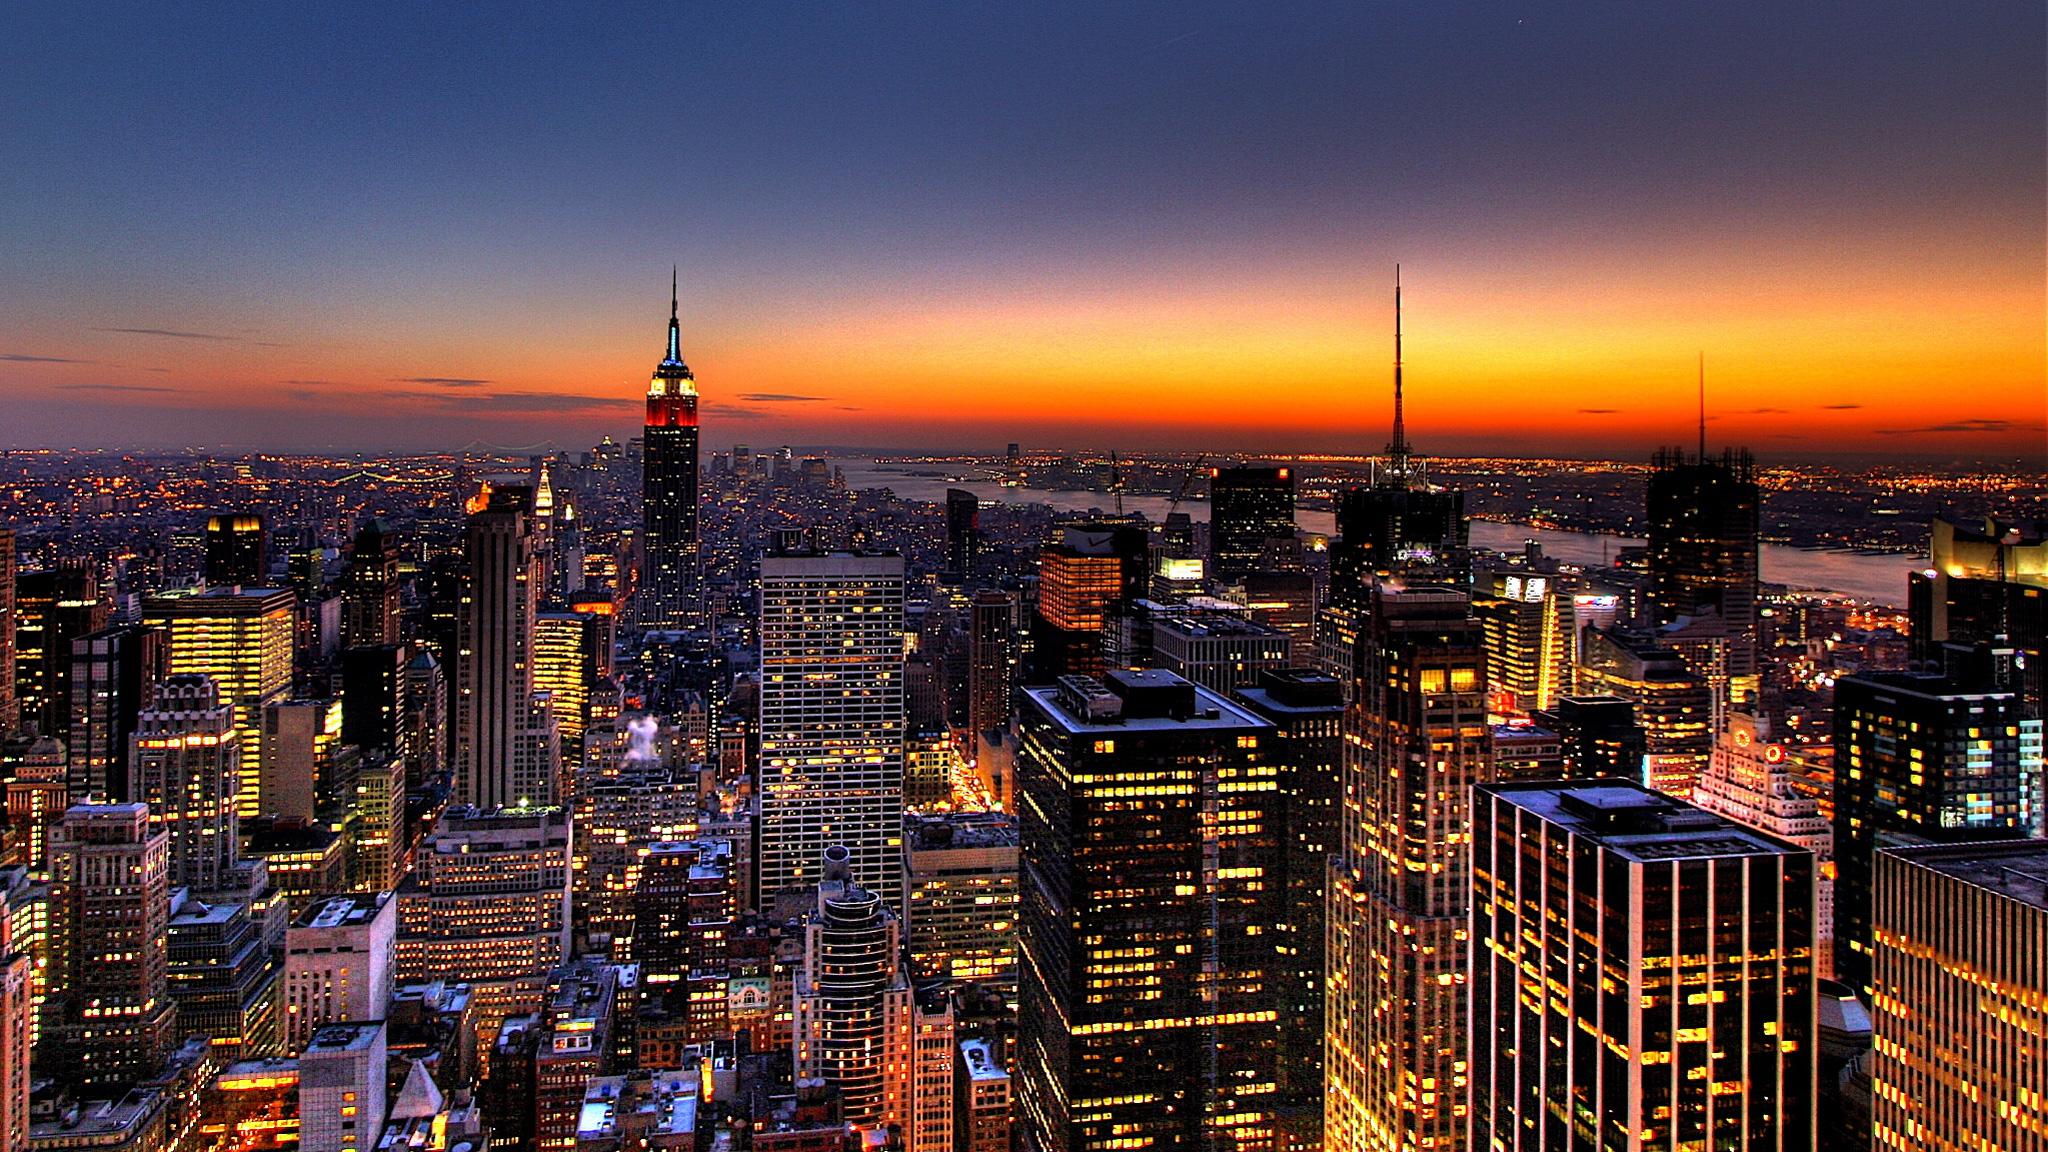 new york city night 2048x1152